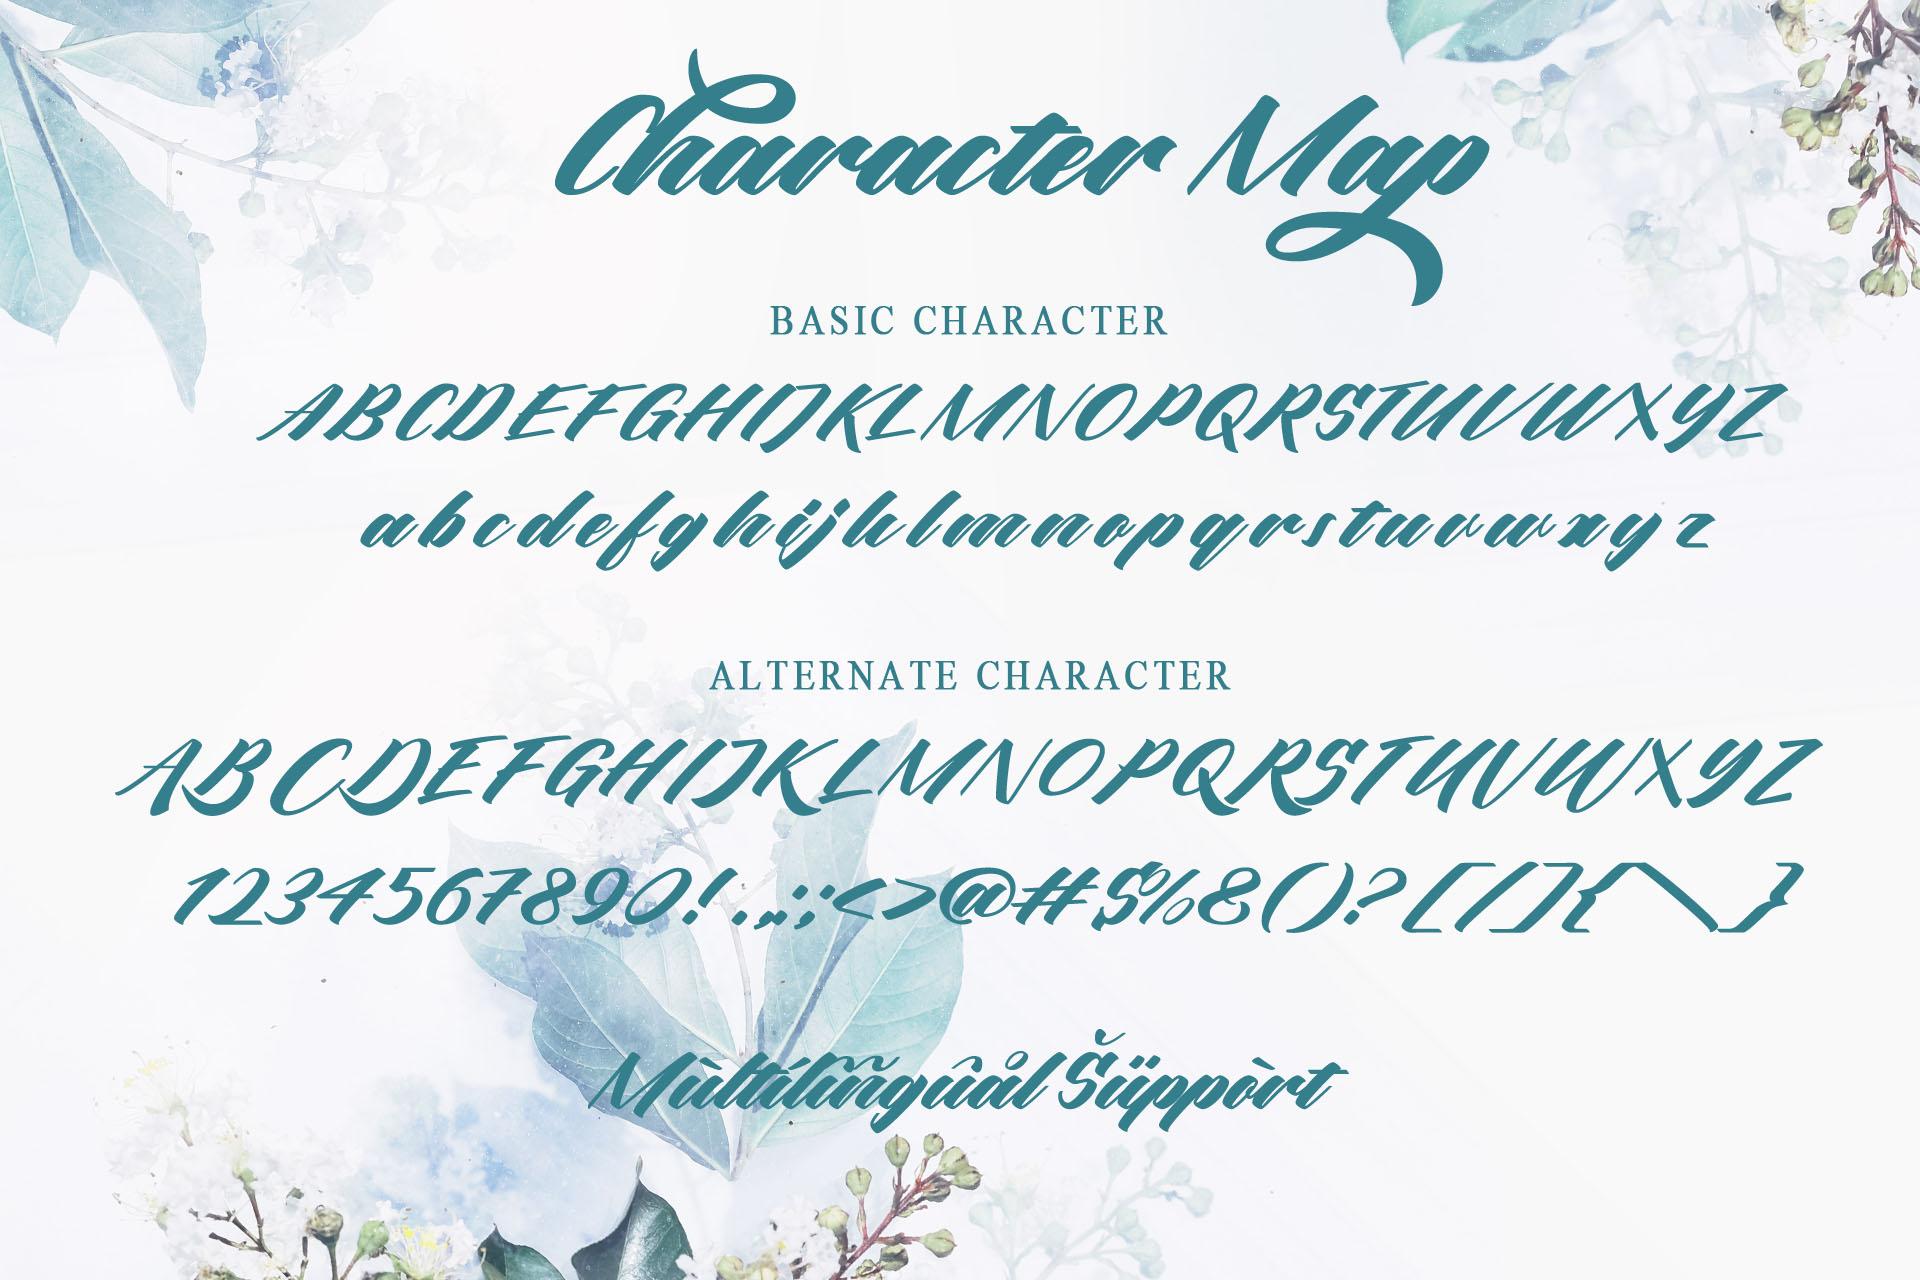 de hafla_CharacterMap